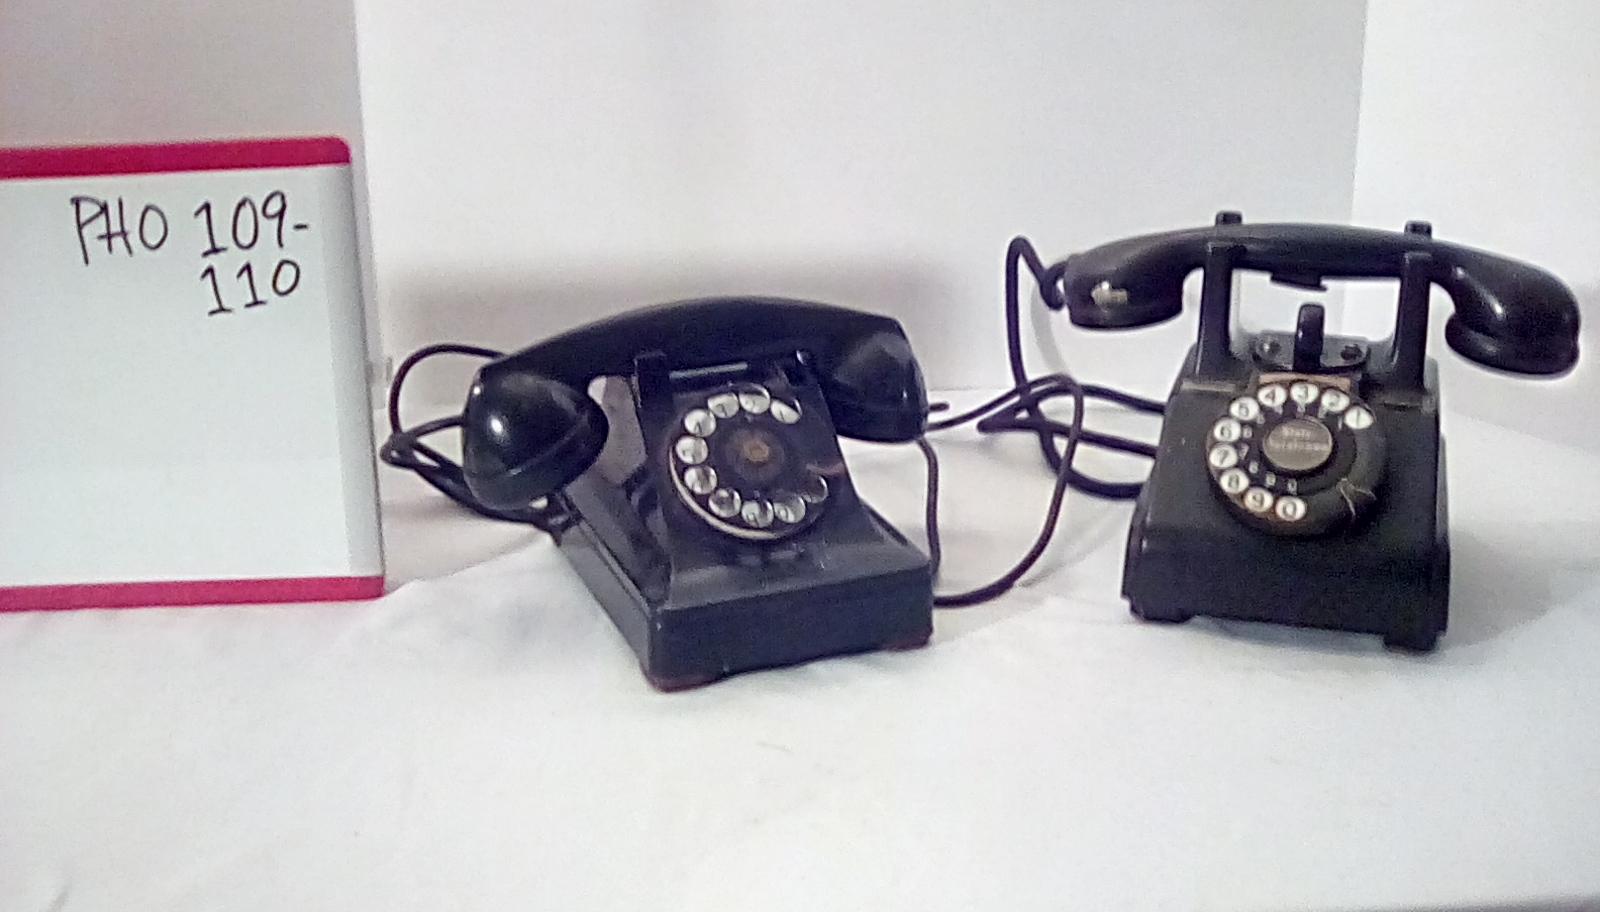 CA109 crosley classic kettle black rotary desk phone, CA110 black rotary desk phone w/raised cradle